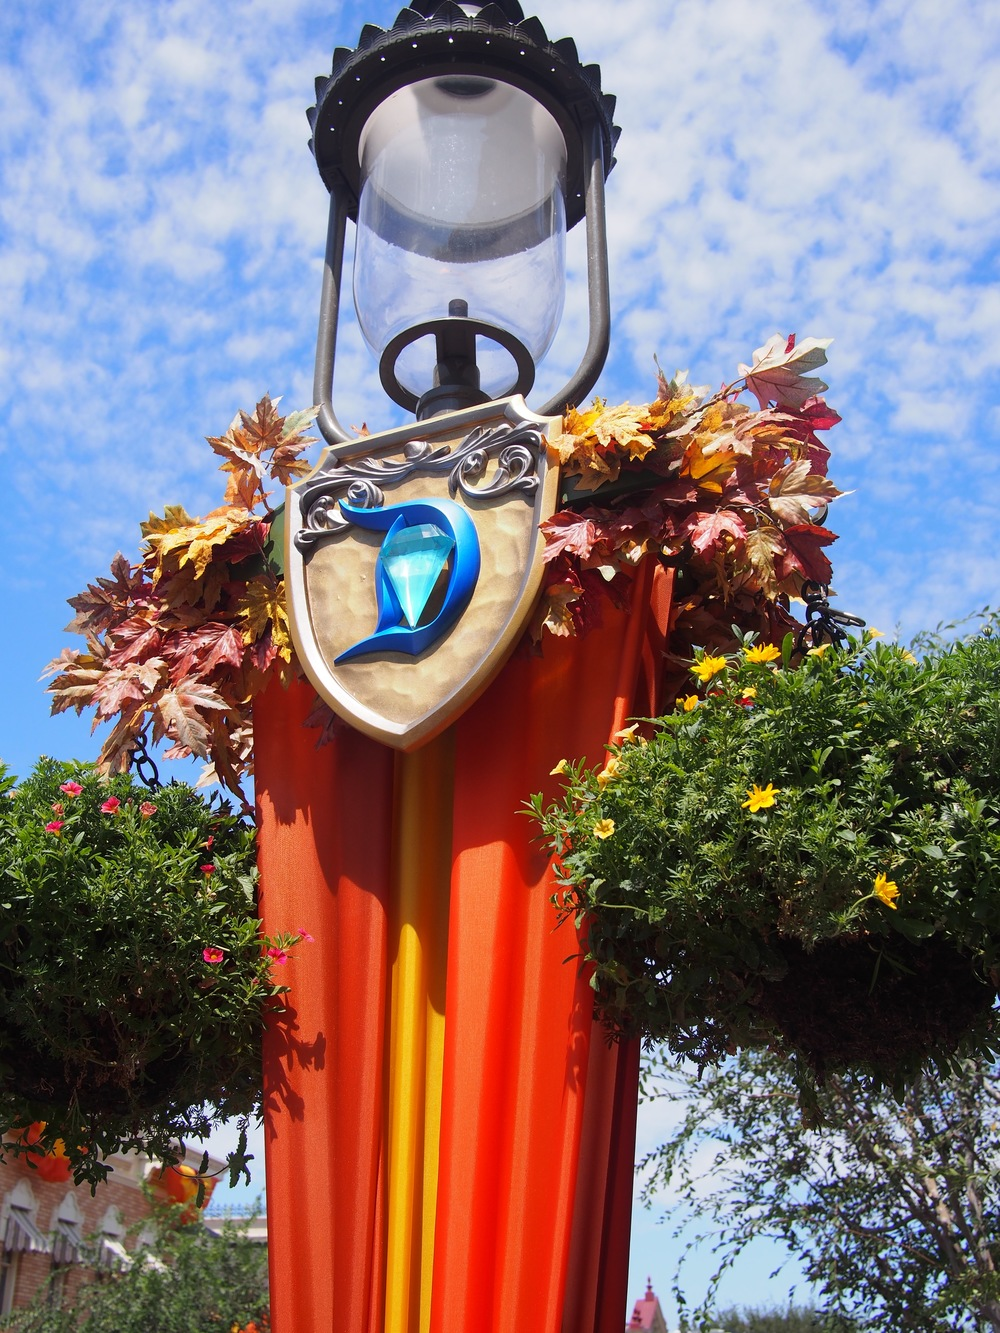 Diamond Celebration combined with Fall Disneyland Decor.